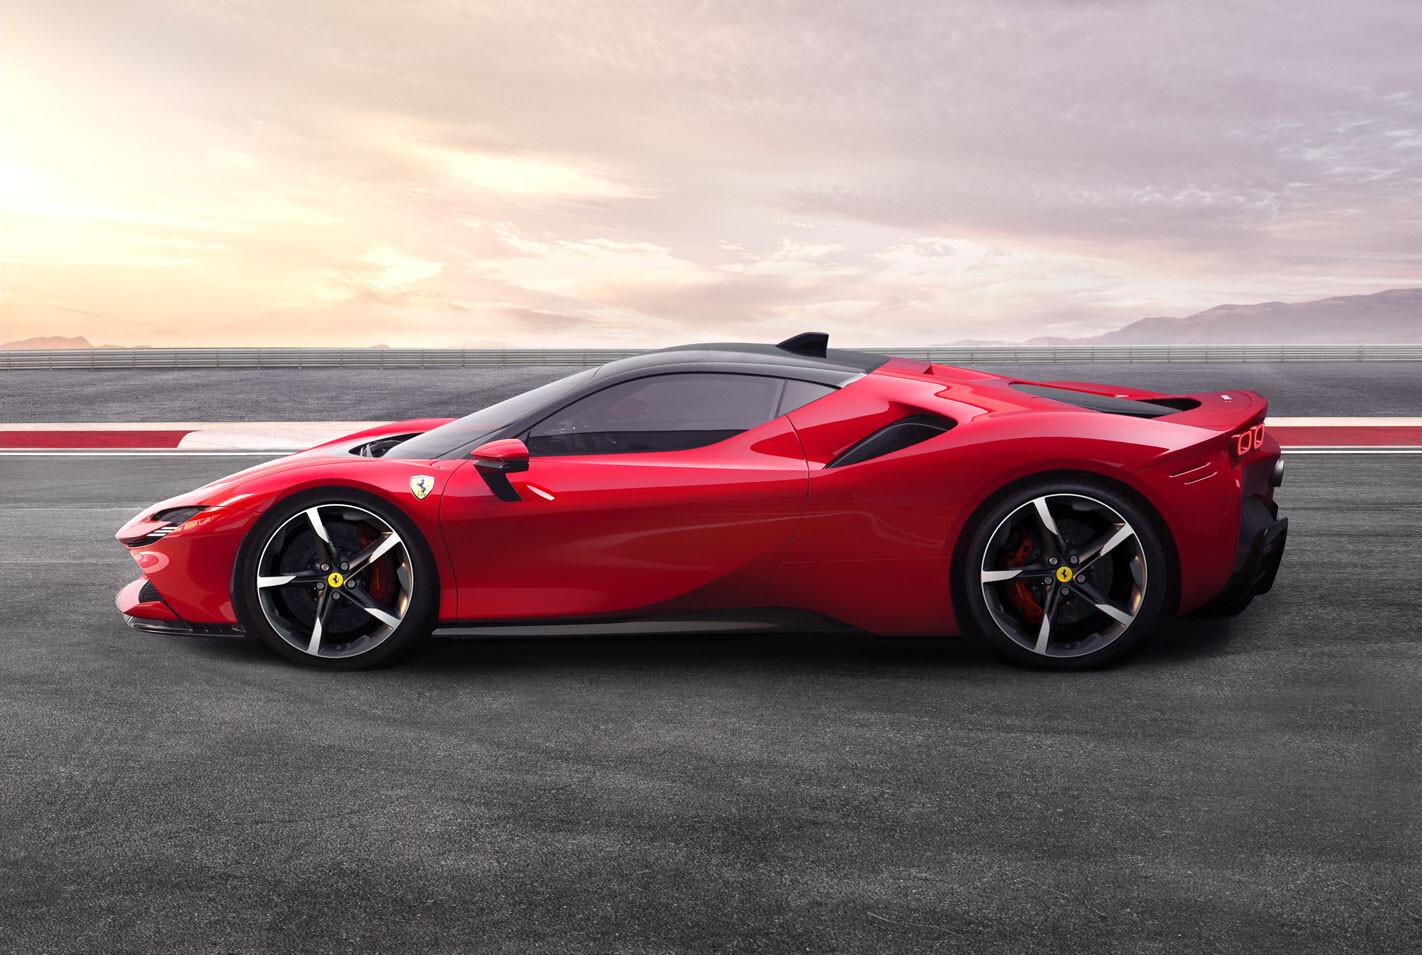 2020 Ferrari SF90 Stradale side view